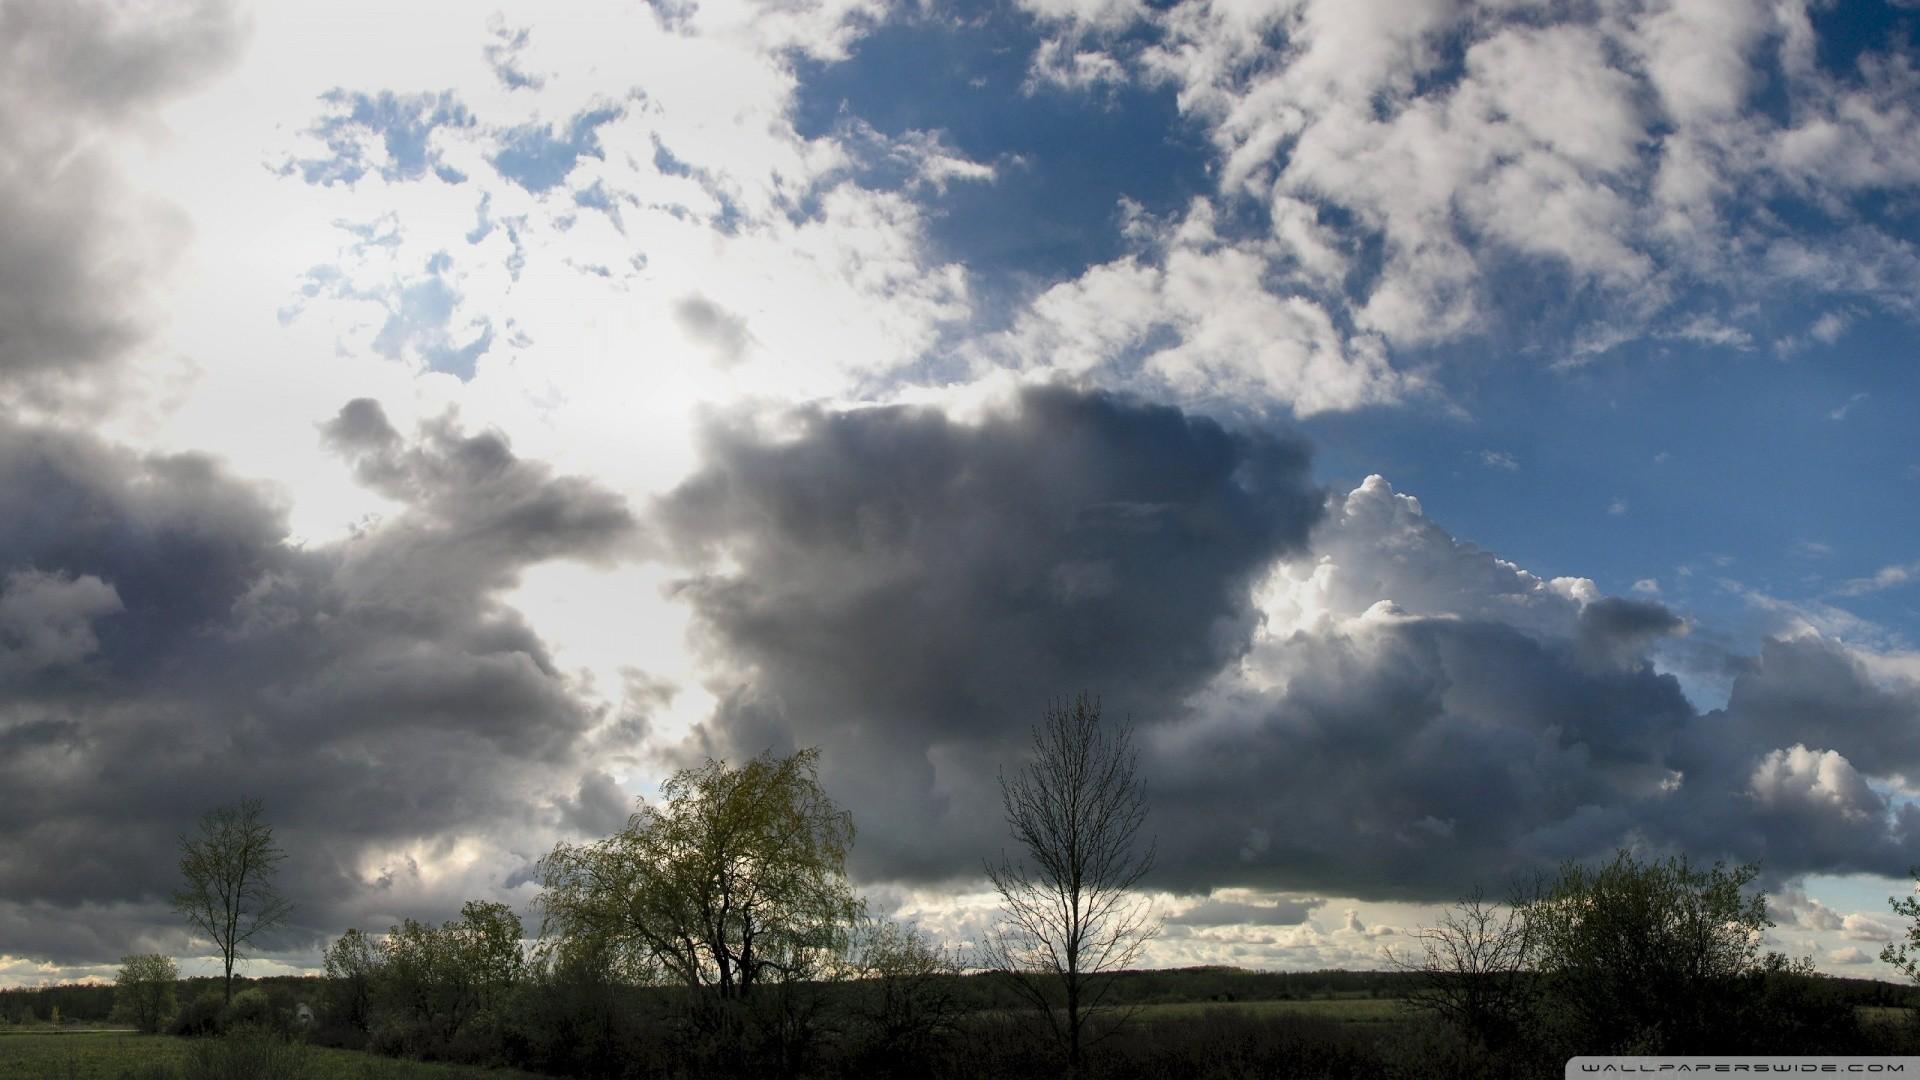 Cloudy Sky Wallpaper Cloudy, Sky